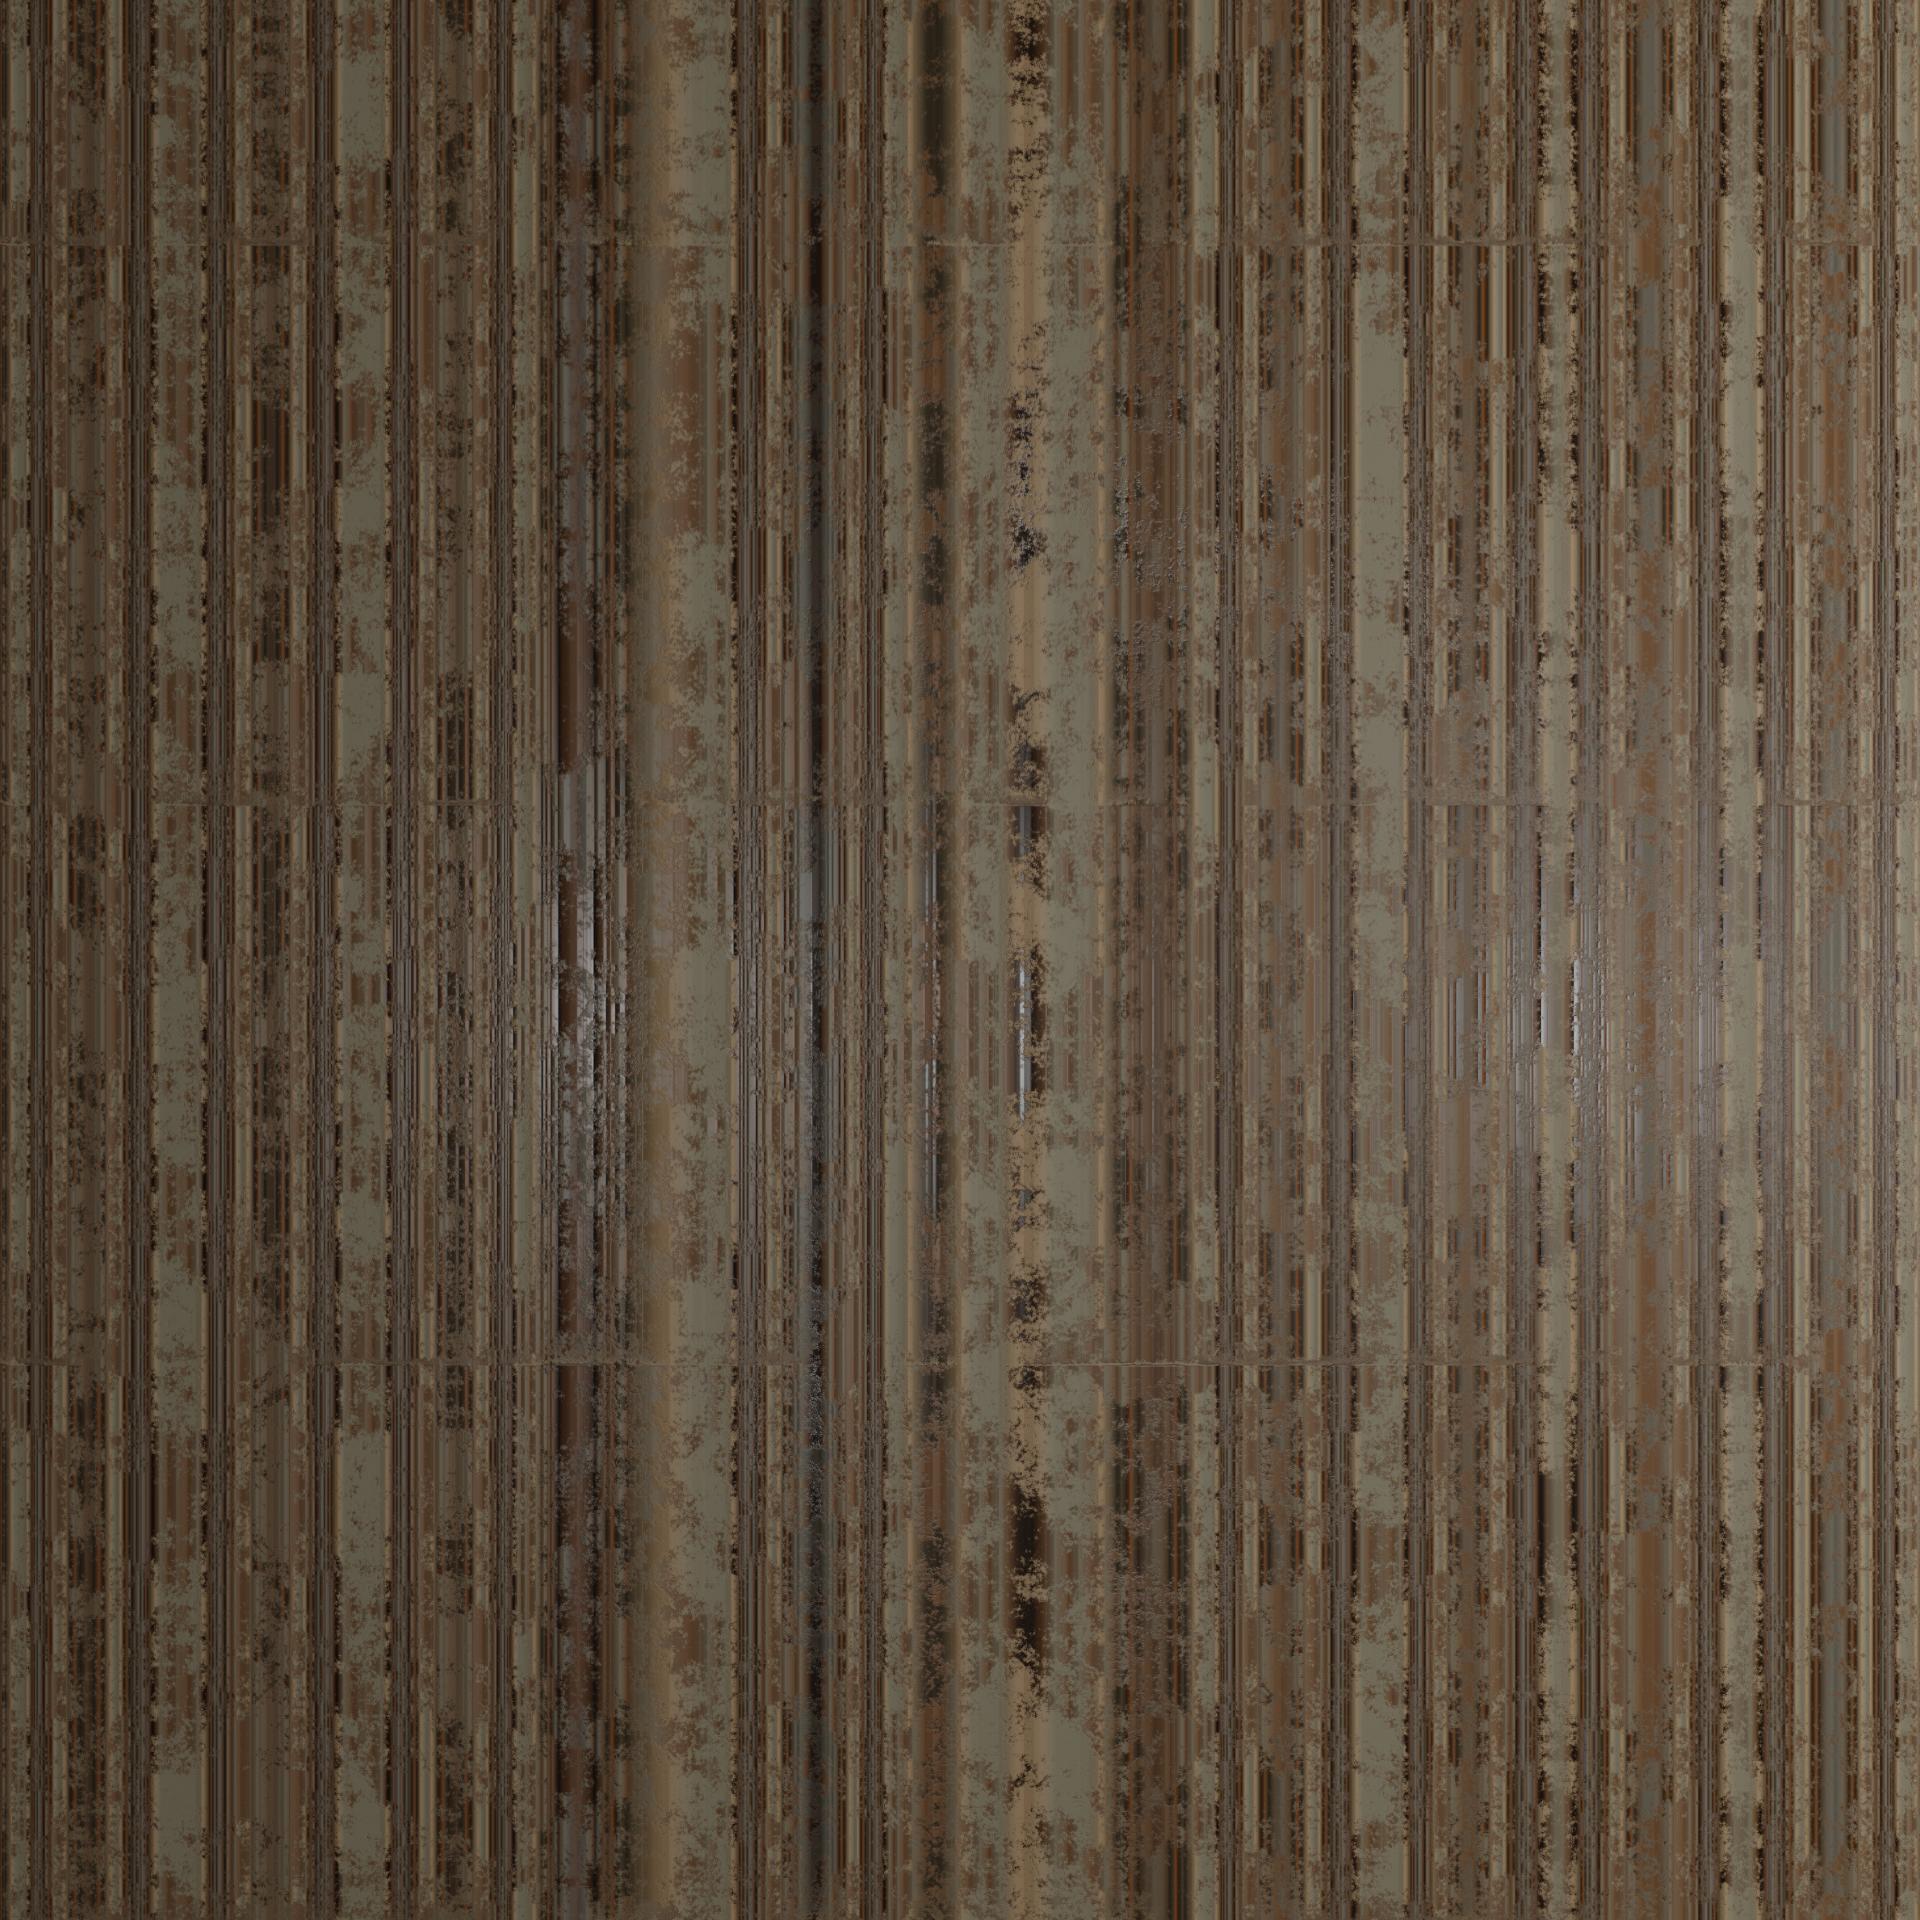 Wood Old Panel 1